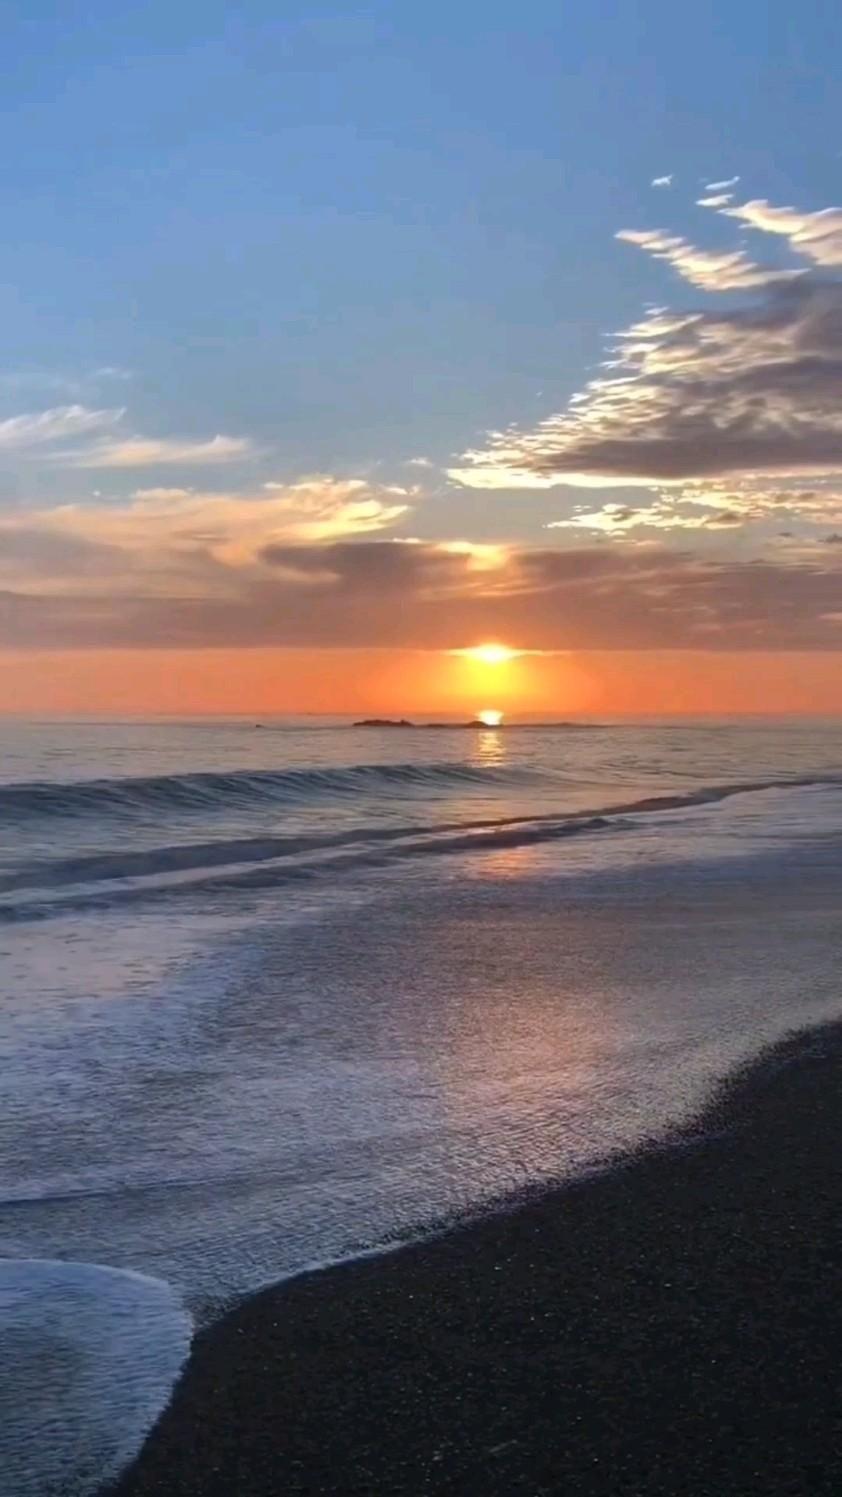 Beach Wave & Sunset